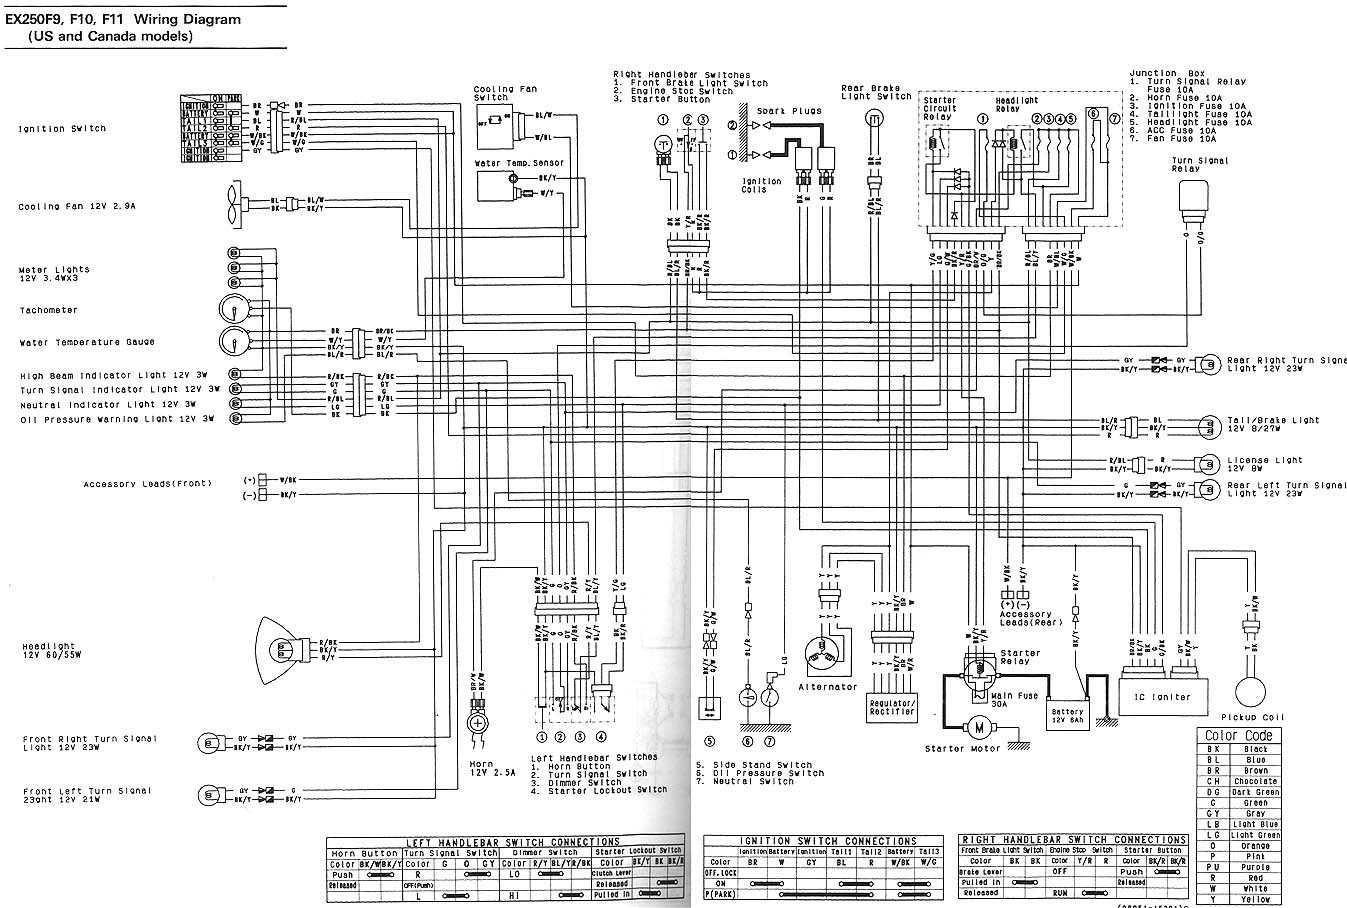 1995 Kawasaki Mule Wiring Diagram Wiring Diagram Fear Explained B Fear Explained B Led Illumina It